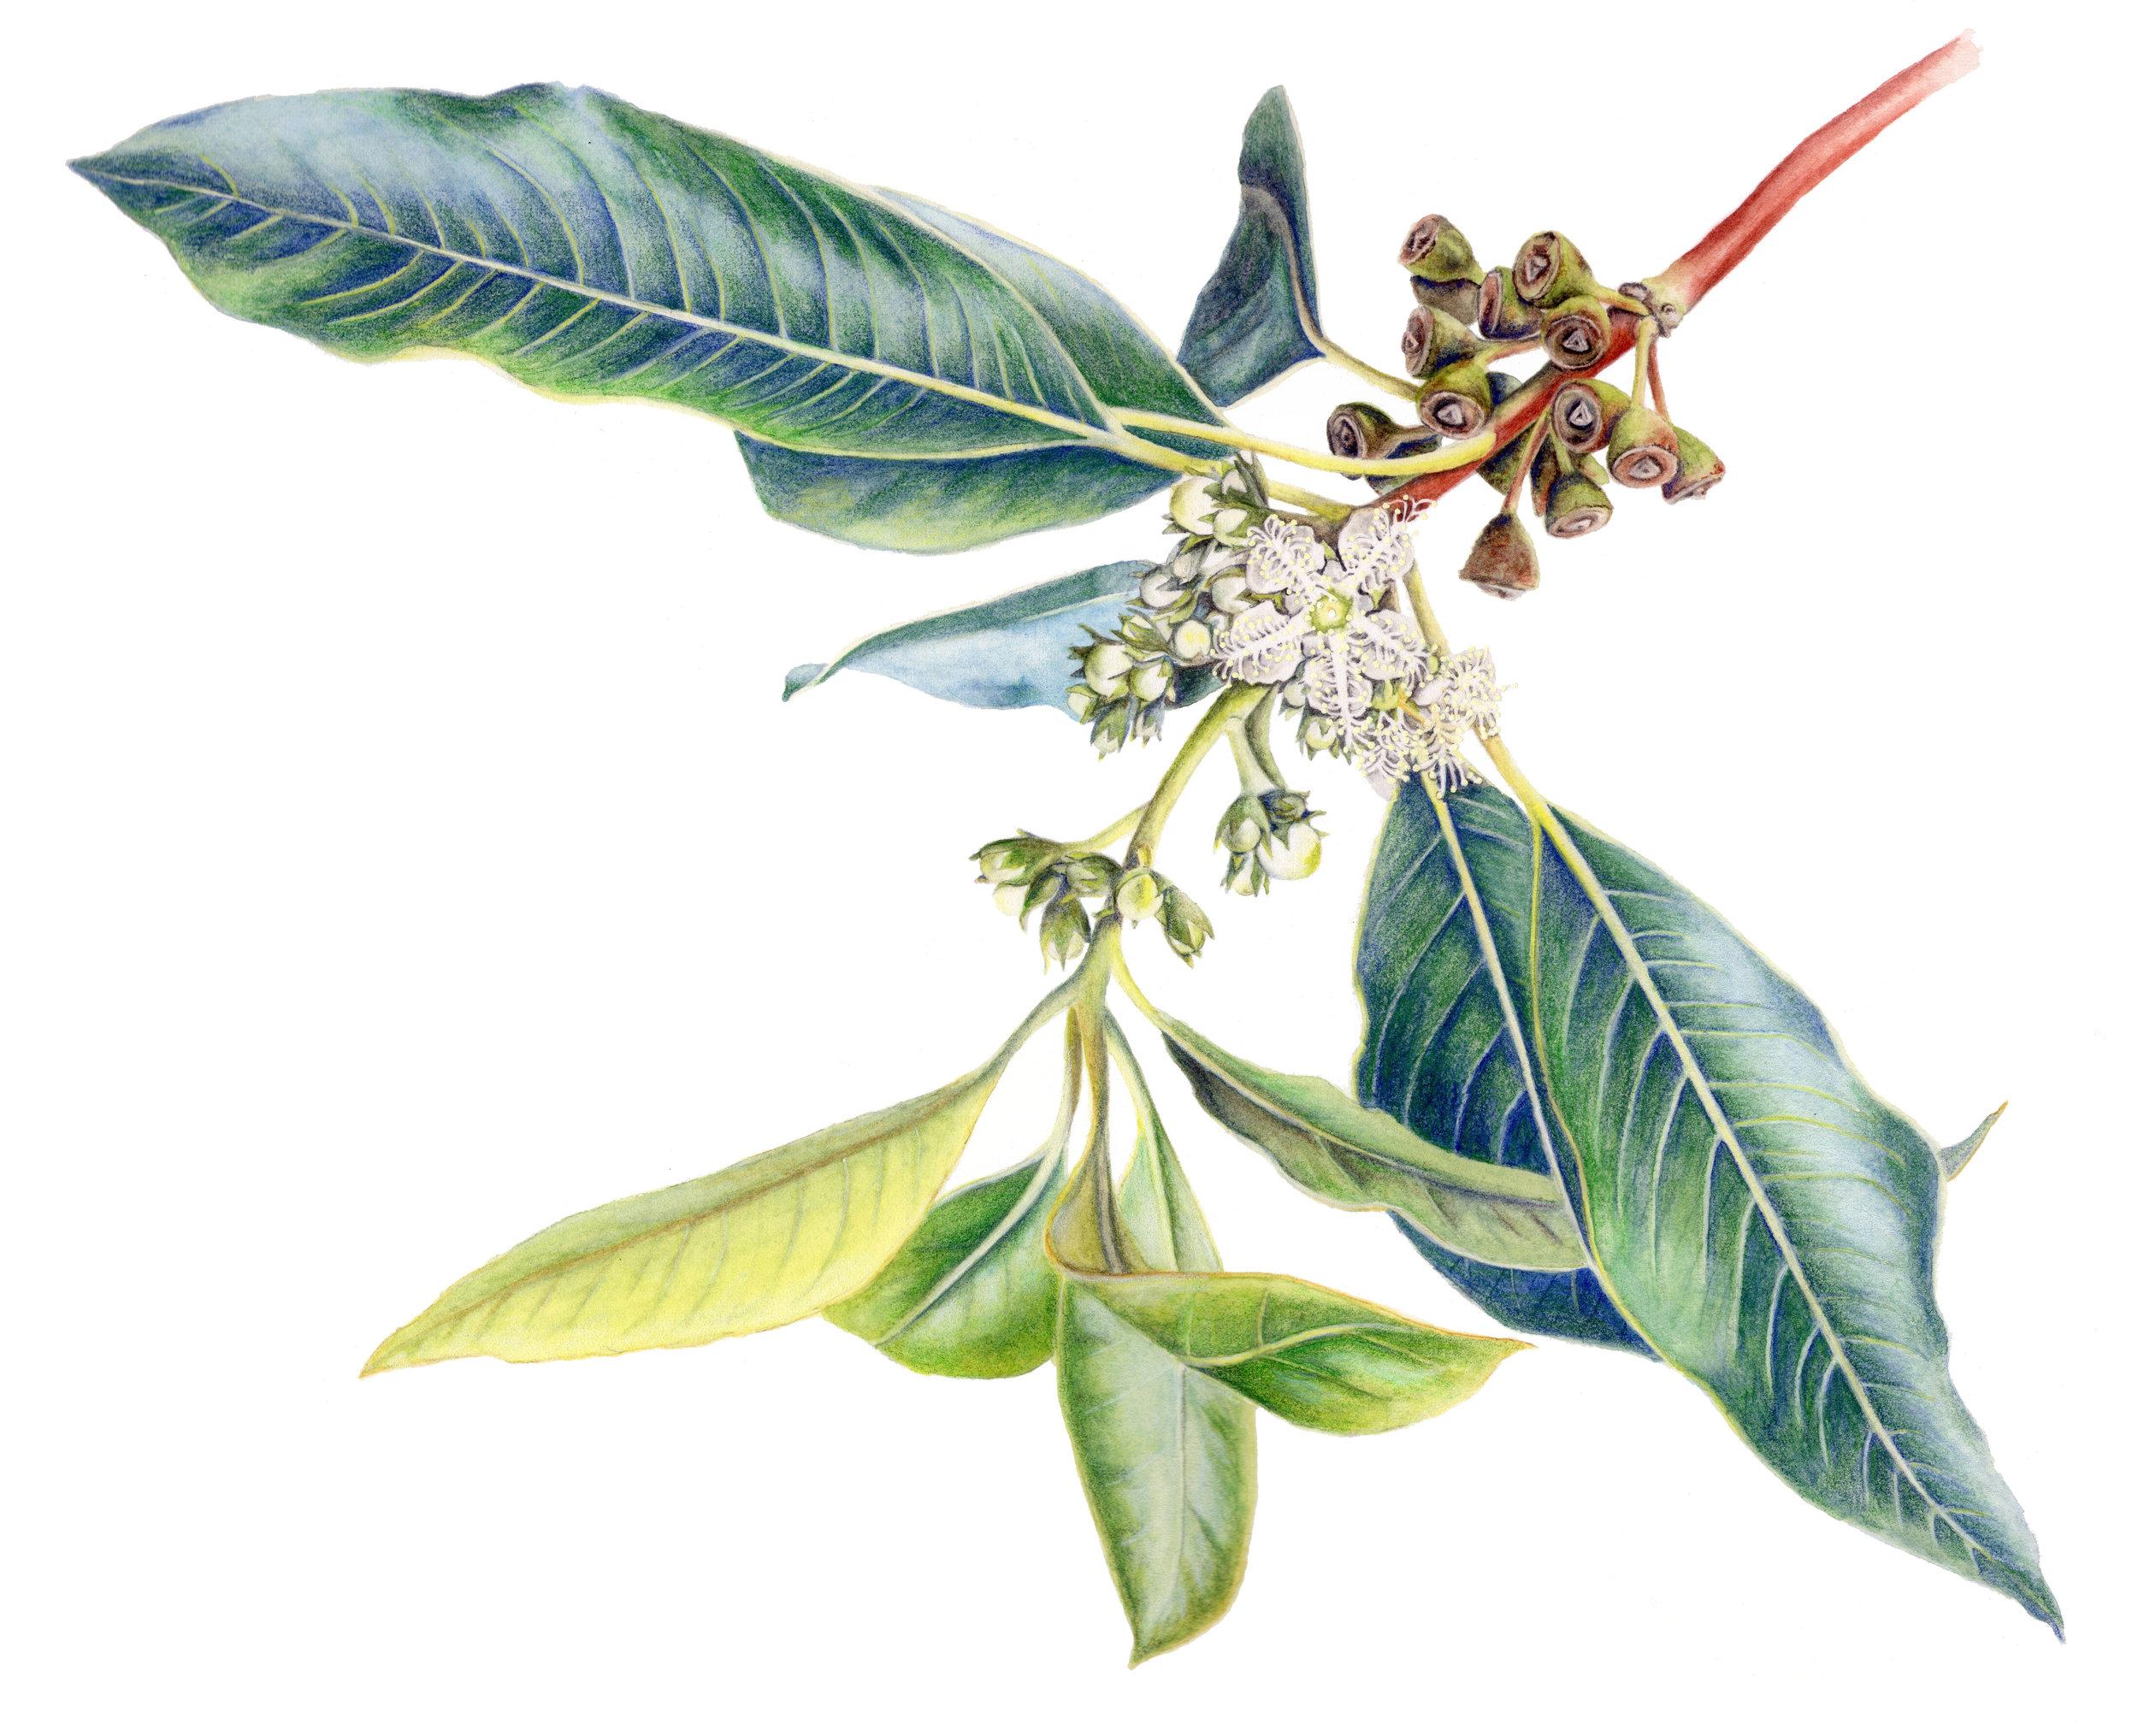 Lophostemon confertus